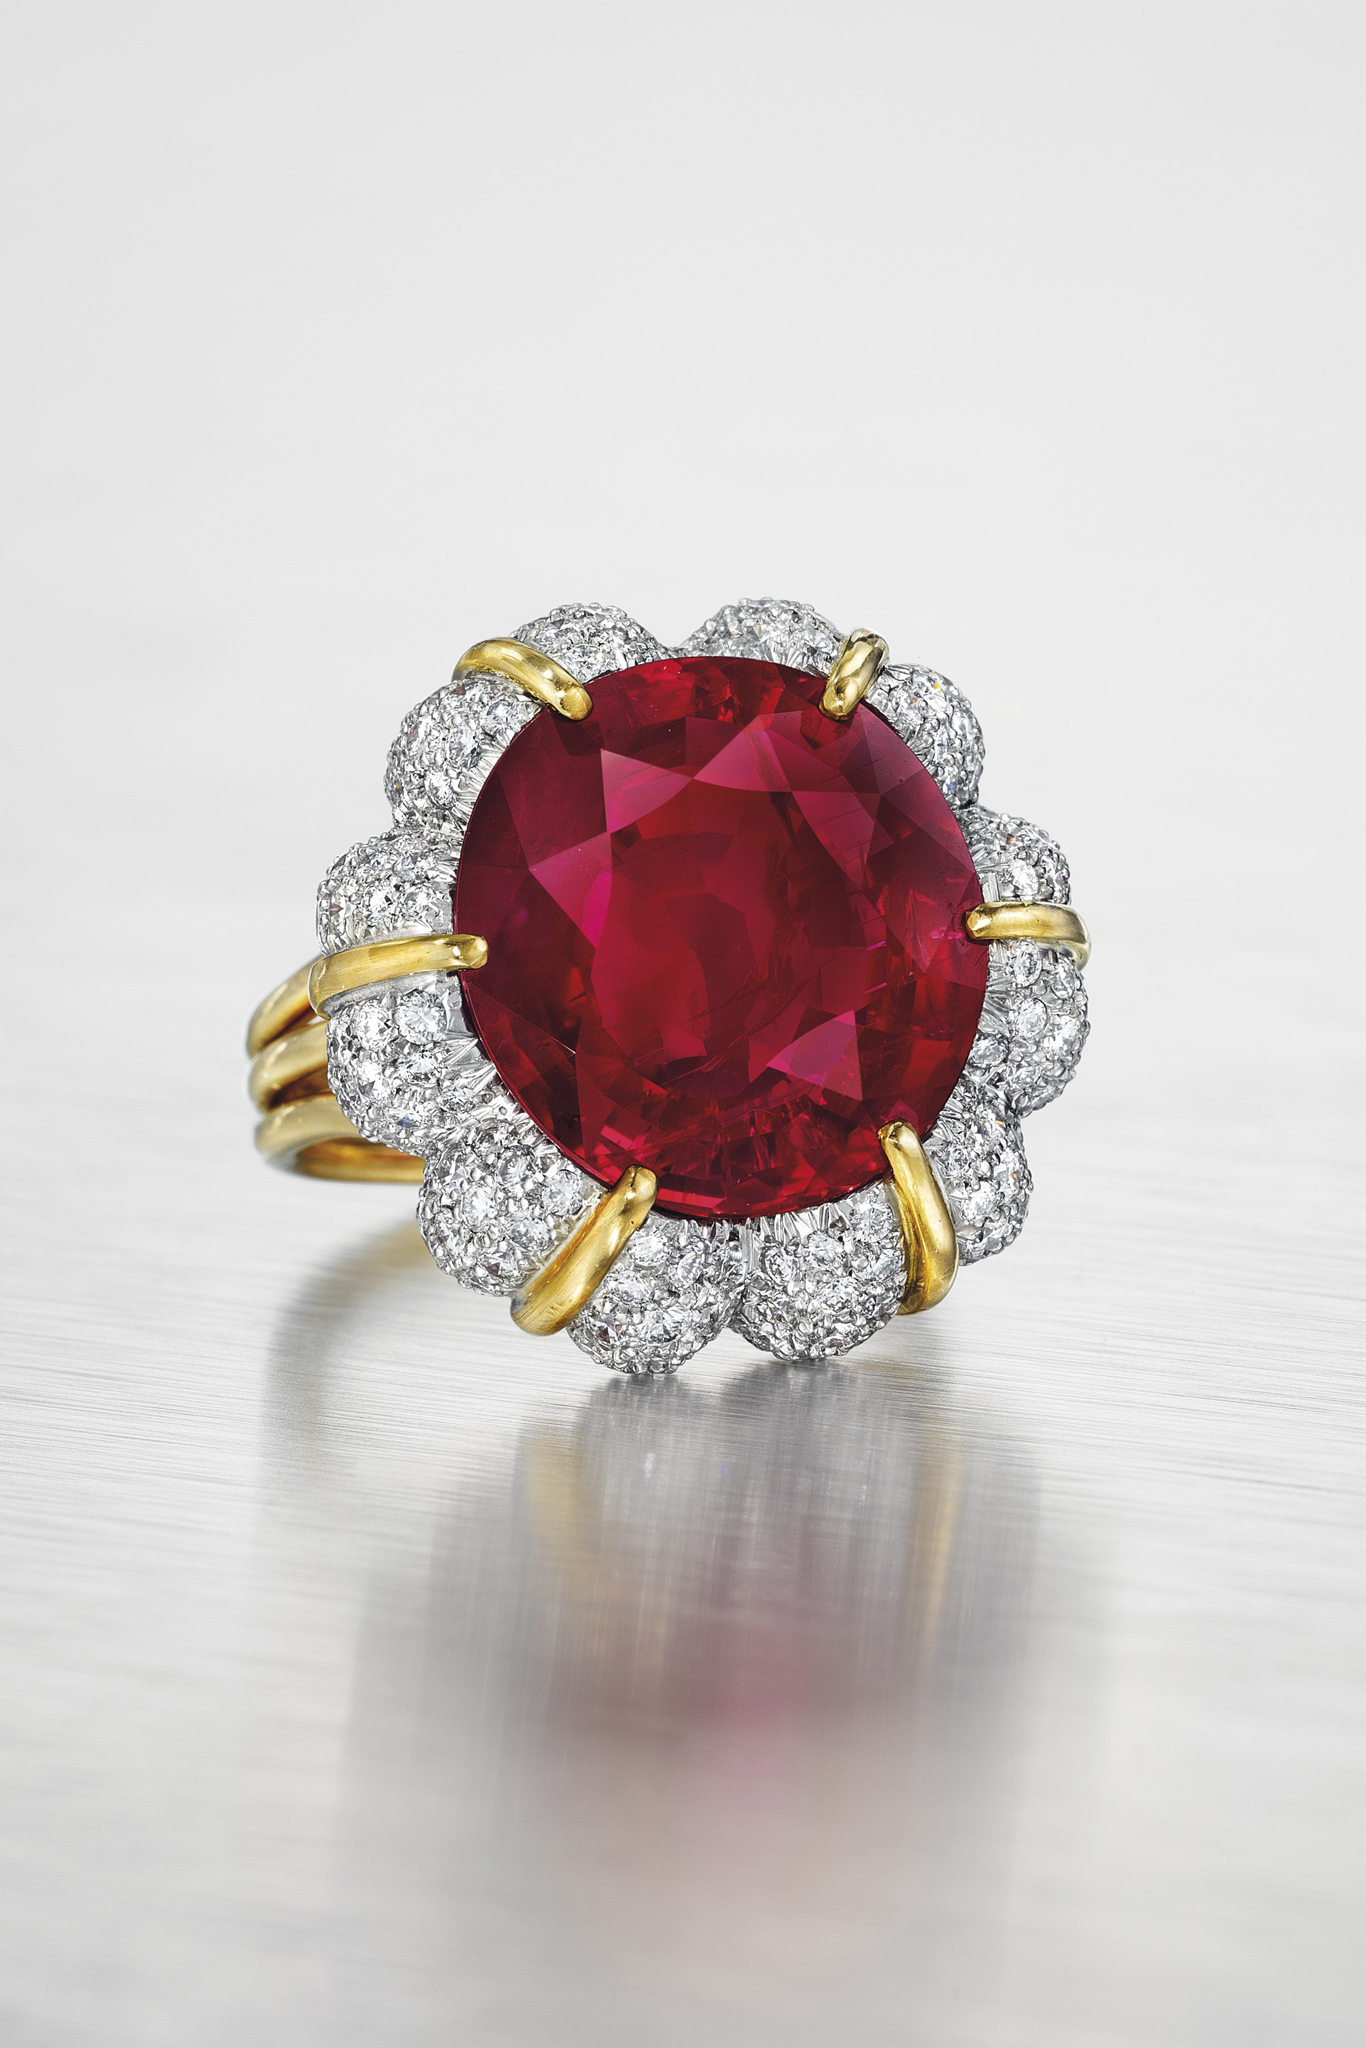 The Jubilee Ruby: a 15.99-karat Burmese ruby and diamond ring by Verdura.